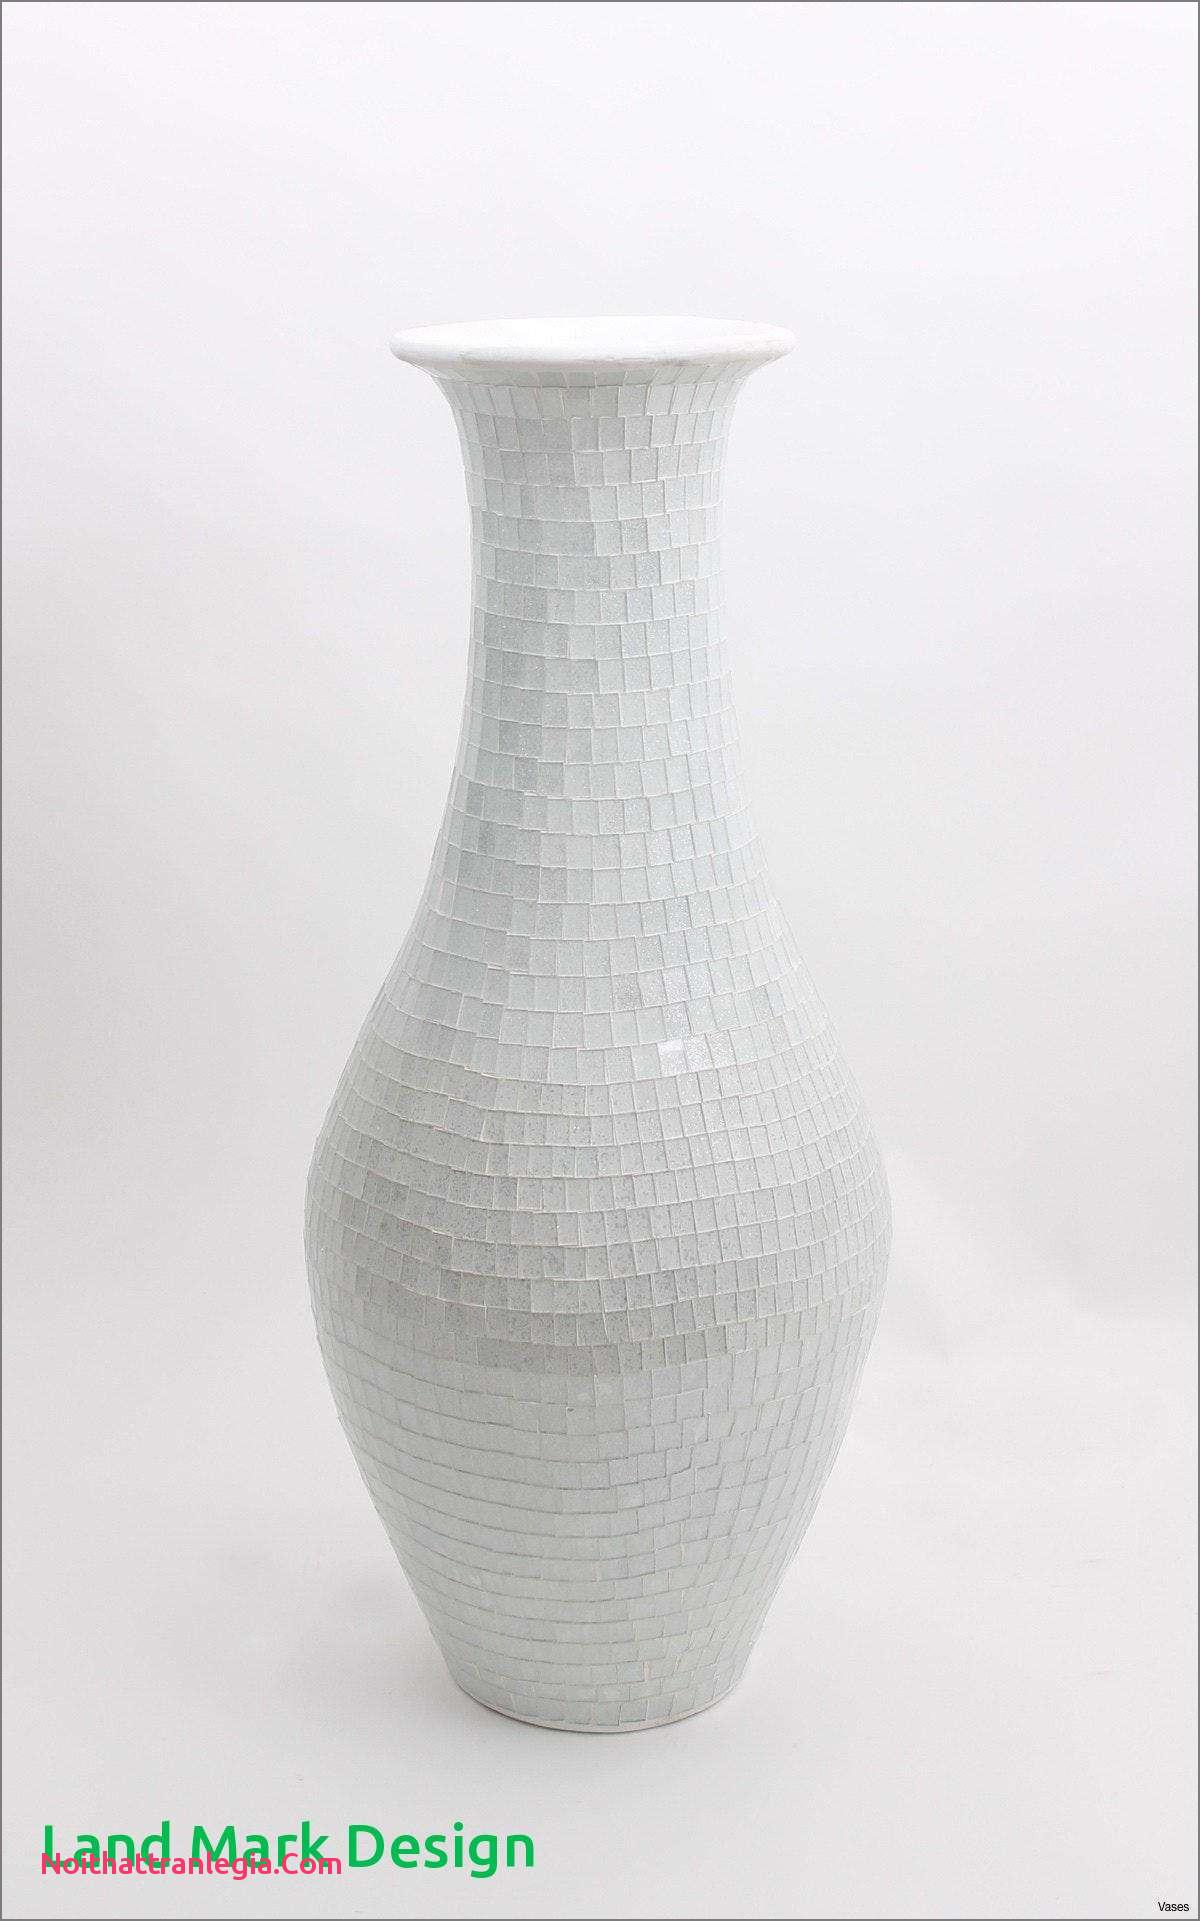 waterford crystal vase price of 20 large floor vase nz noithattranlegia vases design with regard to full size of living room floor vases tall elegant pe s5h vases ikea floor vase